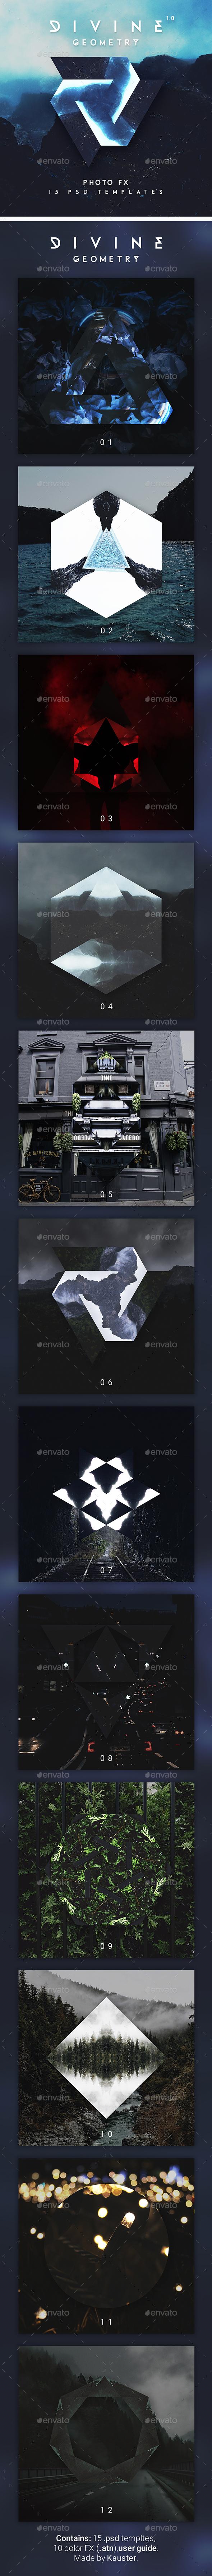 Divine Geometry - Photoshop Photo Template - Photo Templates Graphics